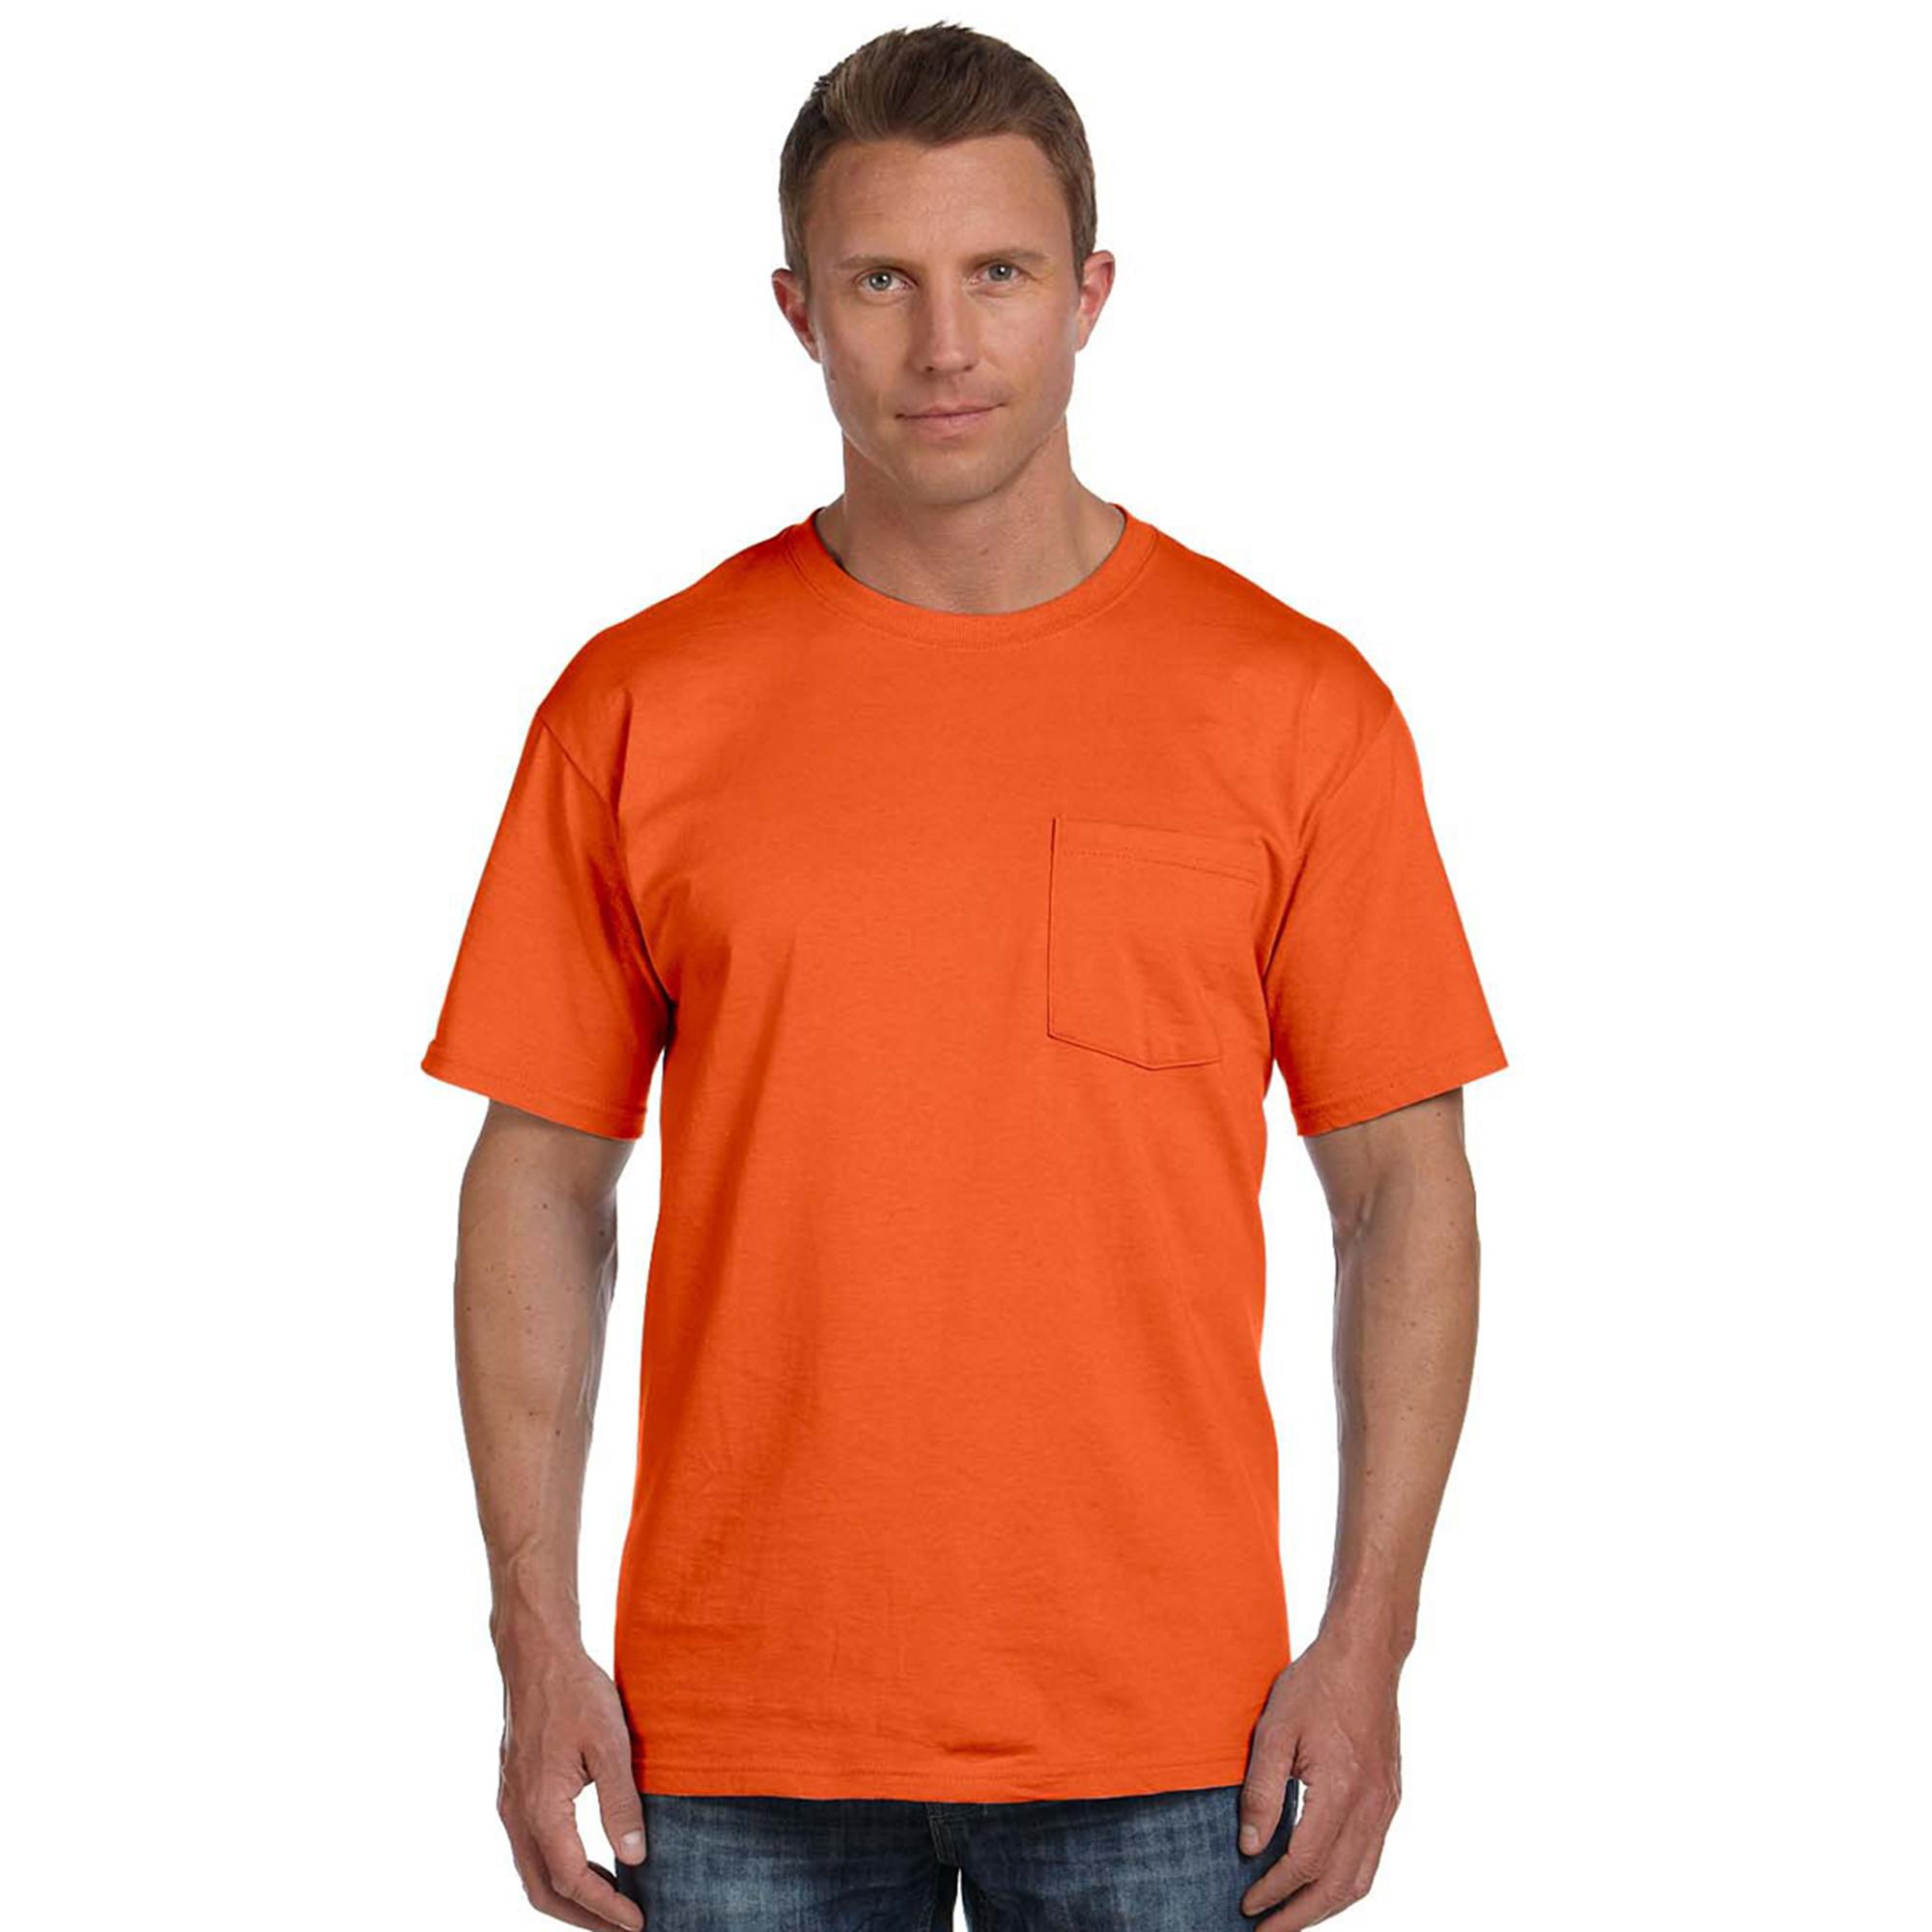 Fruit of the Loom 3931P Men's Tight Woven Pocket Lightweight T-Shirt